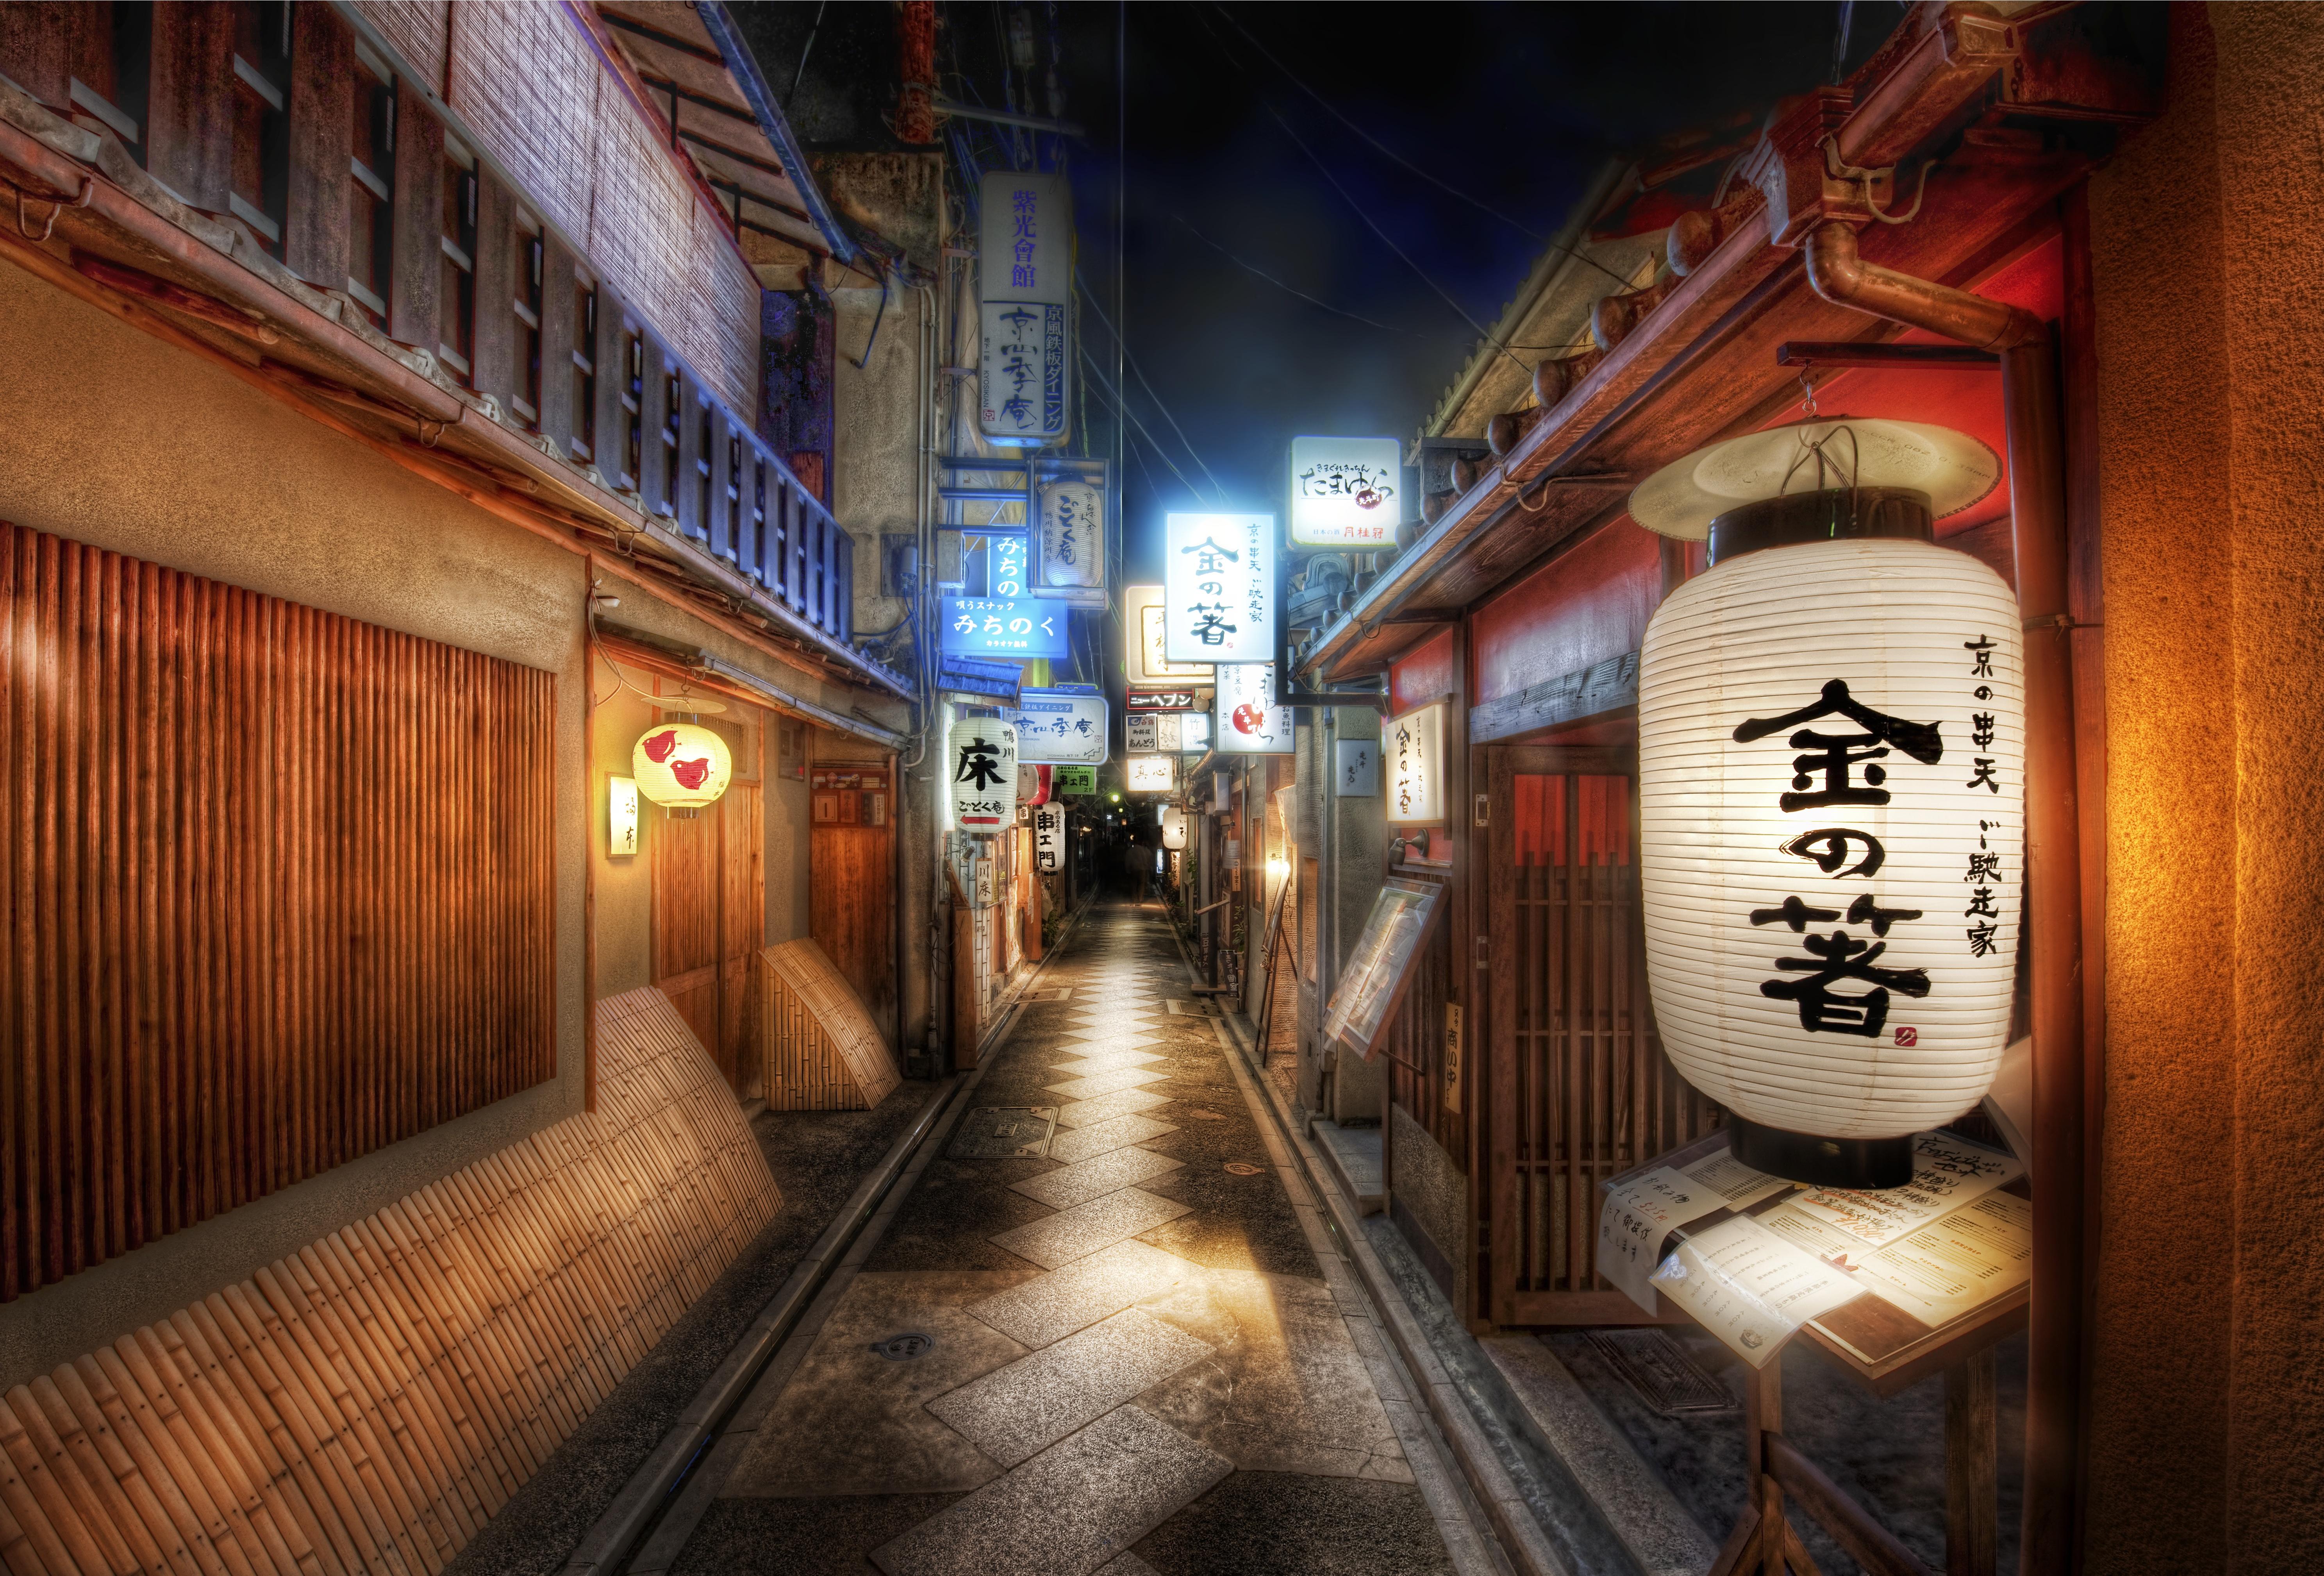 Alley Japan Kyoto Lantern Night Street 5950x4034